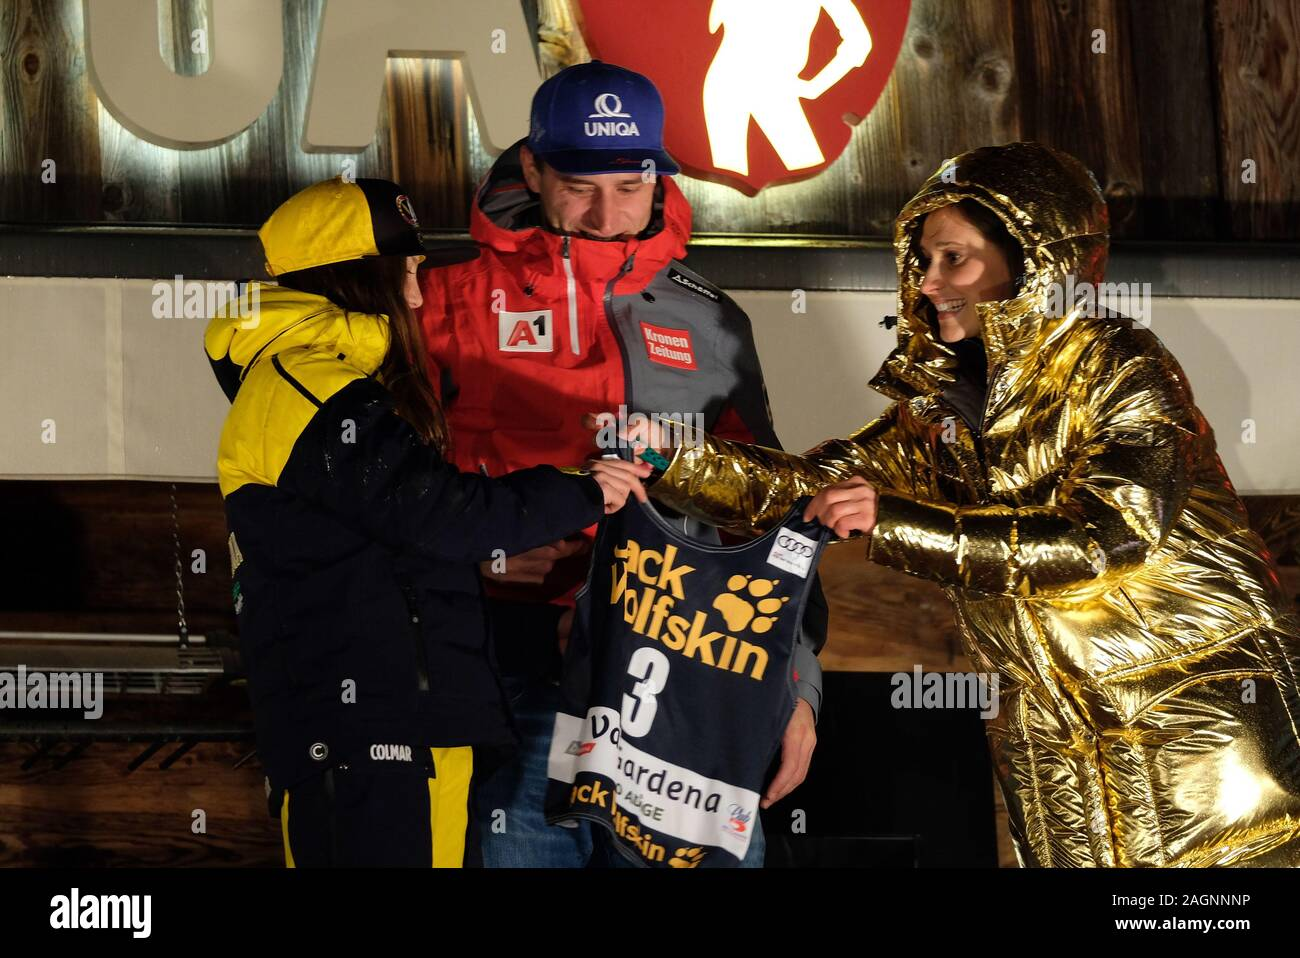 December 20, 2019, Val Gardena, Italy: mathias mayerduring FIS SKI WORLD CUP 2019 - Super G Men - Number assignment, Ski in Val Gardena, Italy, December 20 2019 - LPS/Roberto Tommasini (Credit Image: © Roberto Tommasini/LPS via ZUMA Wire) Stock Photo